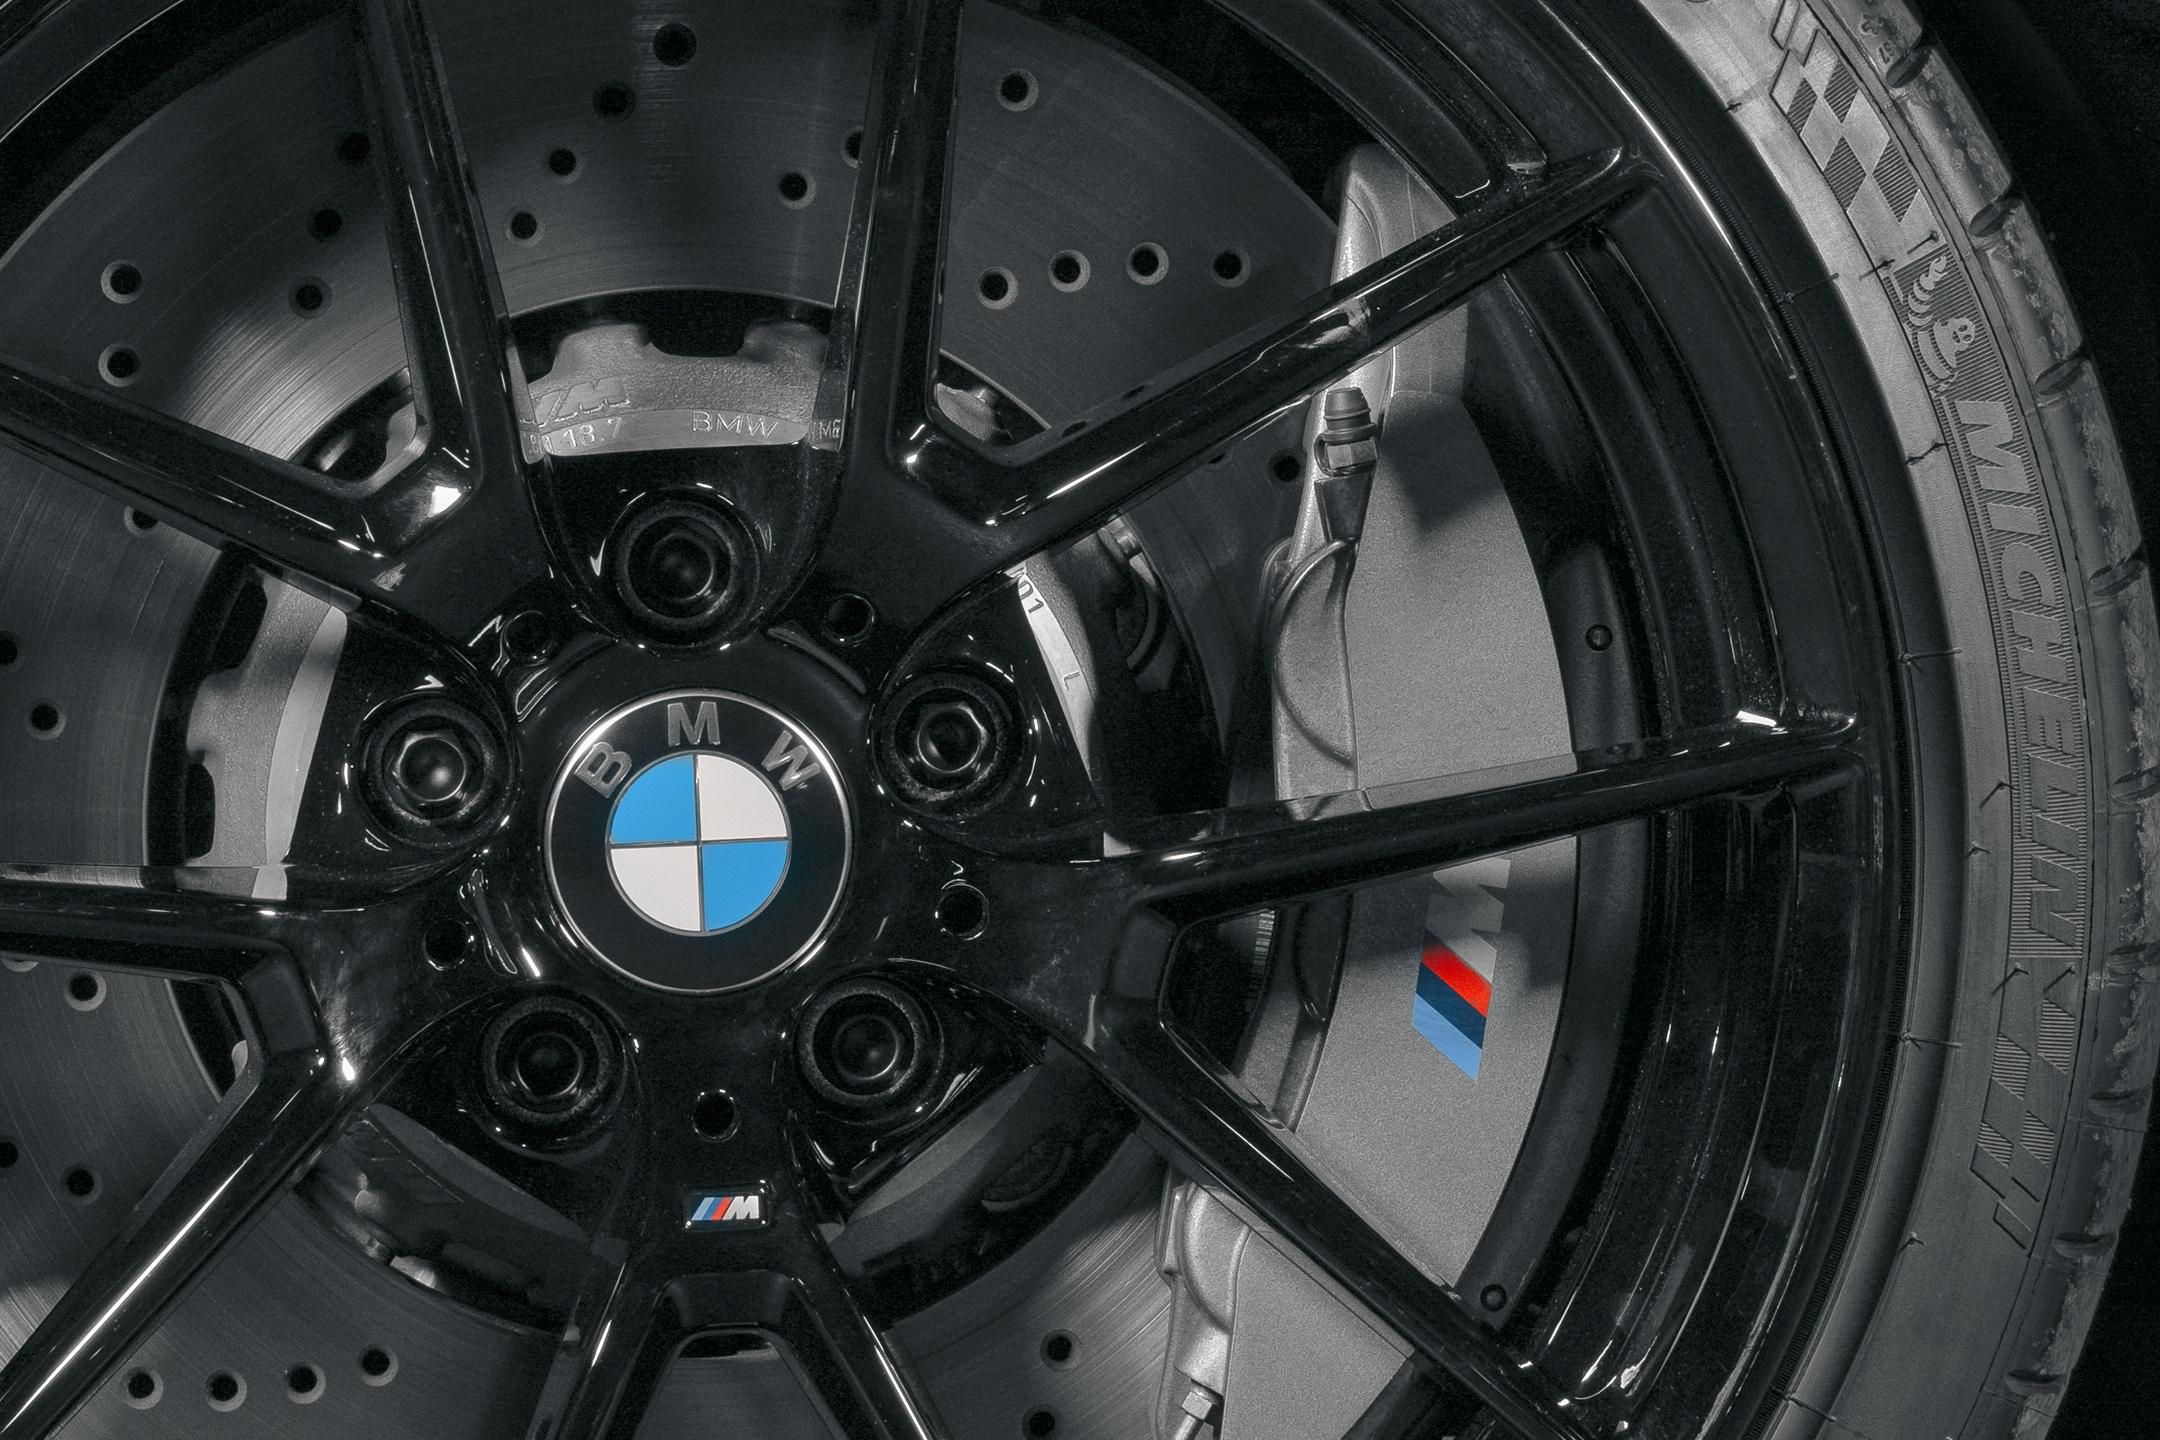 BMW M2 by FUTURA 2000 - Street Art Car - 2020 - wheel / jante - tyre / pneu - Michelin - zoom